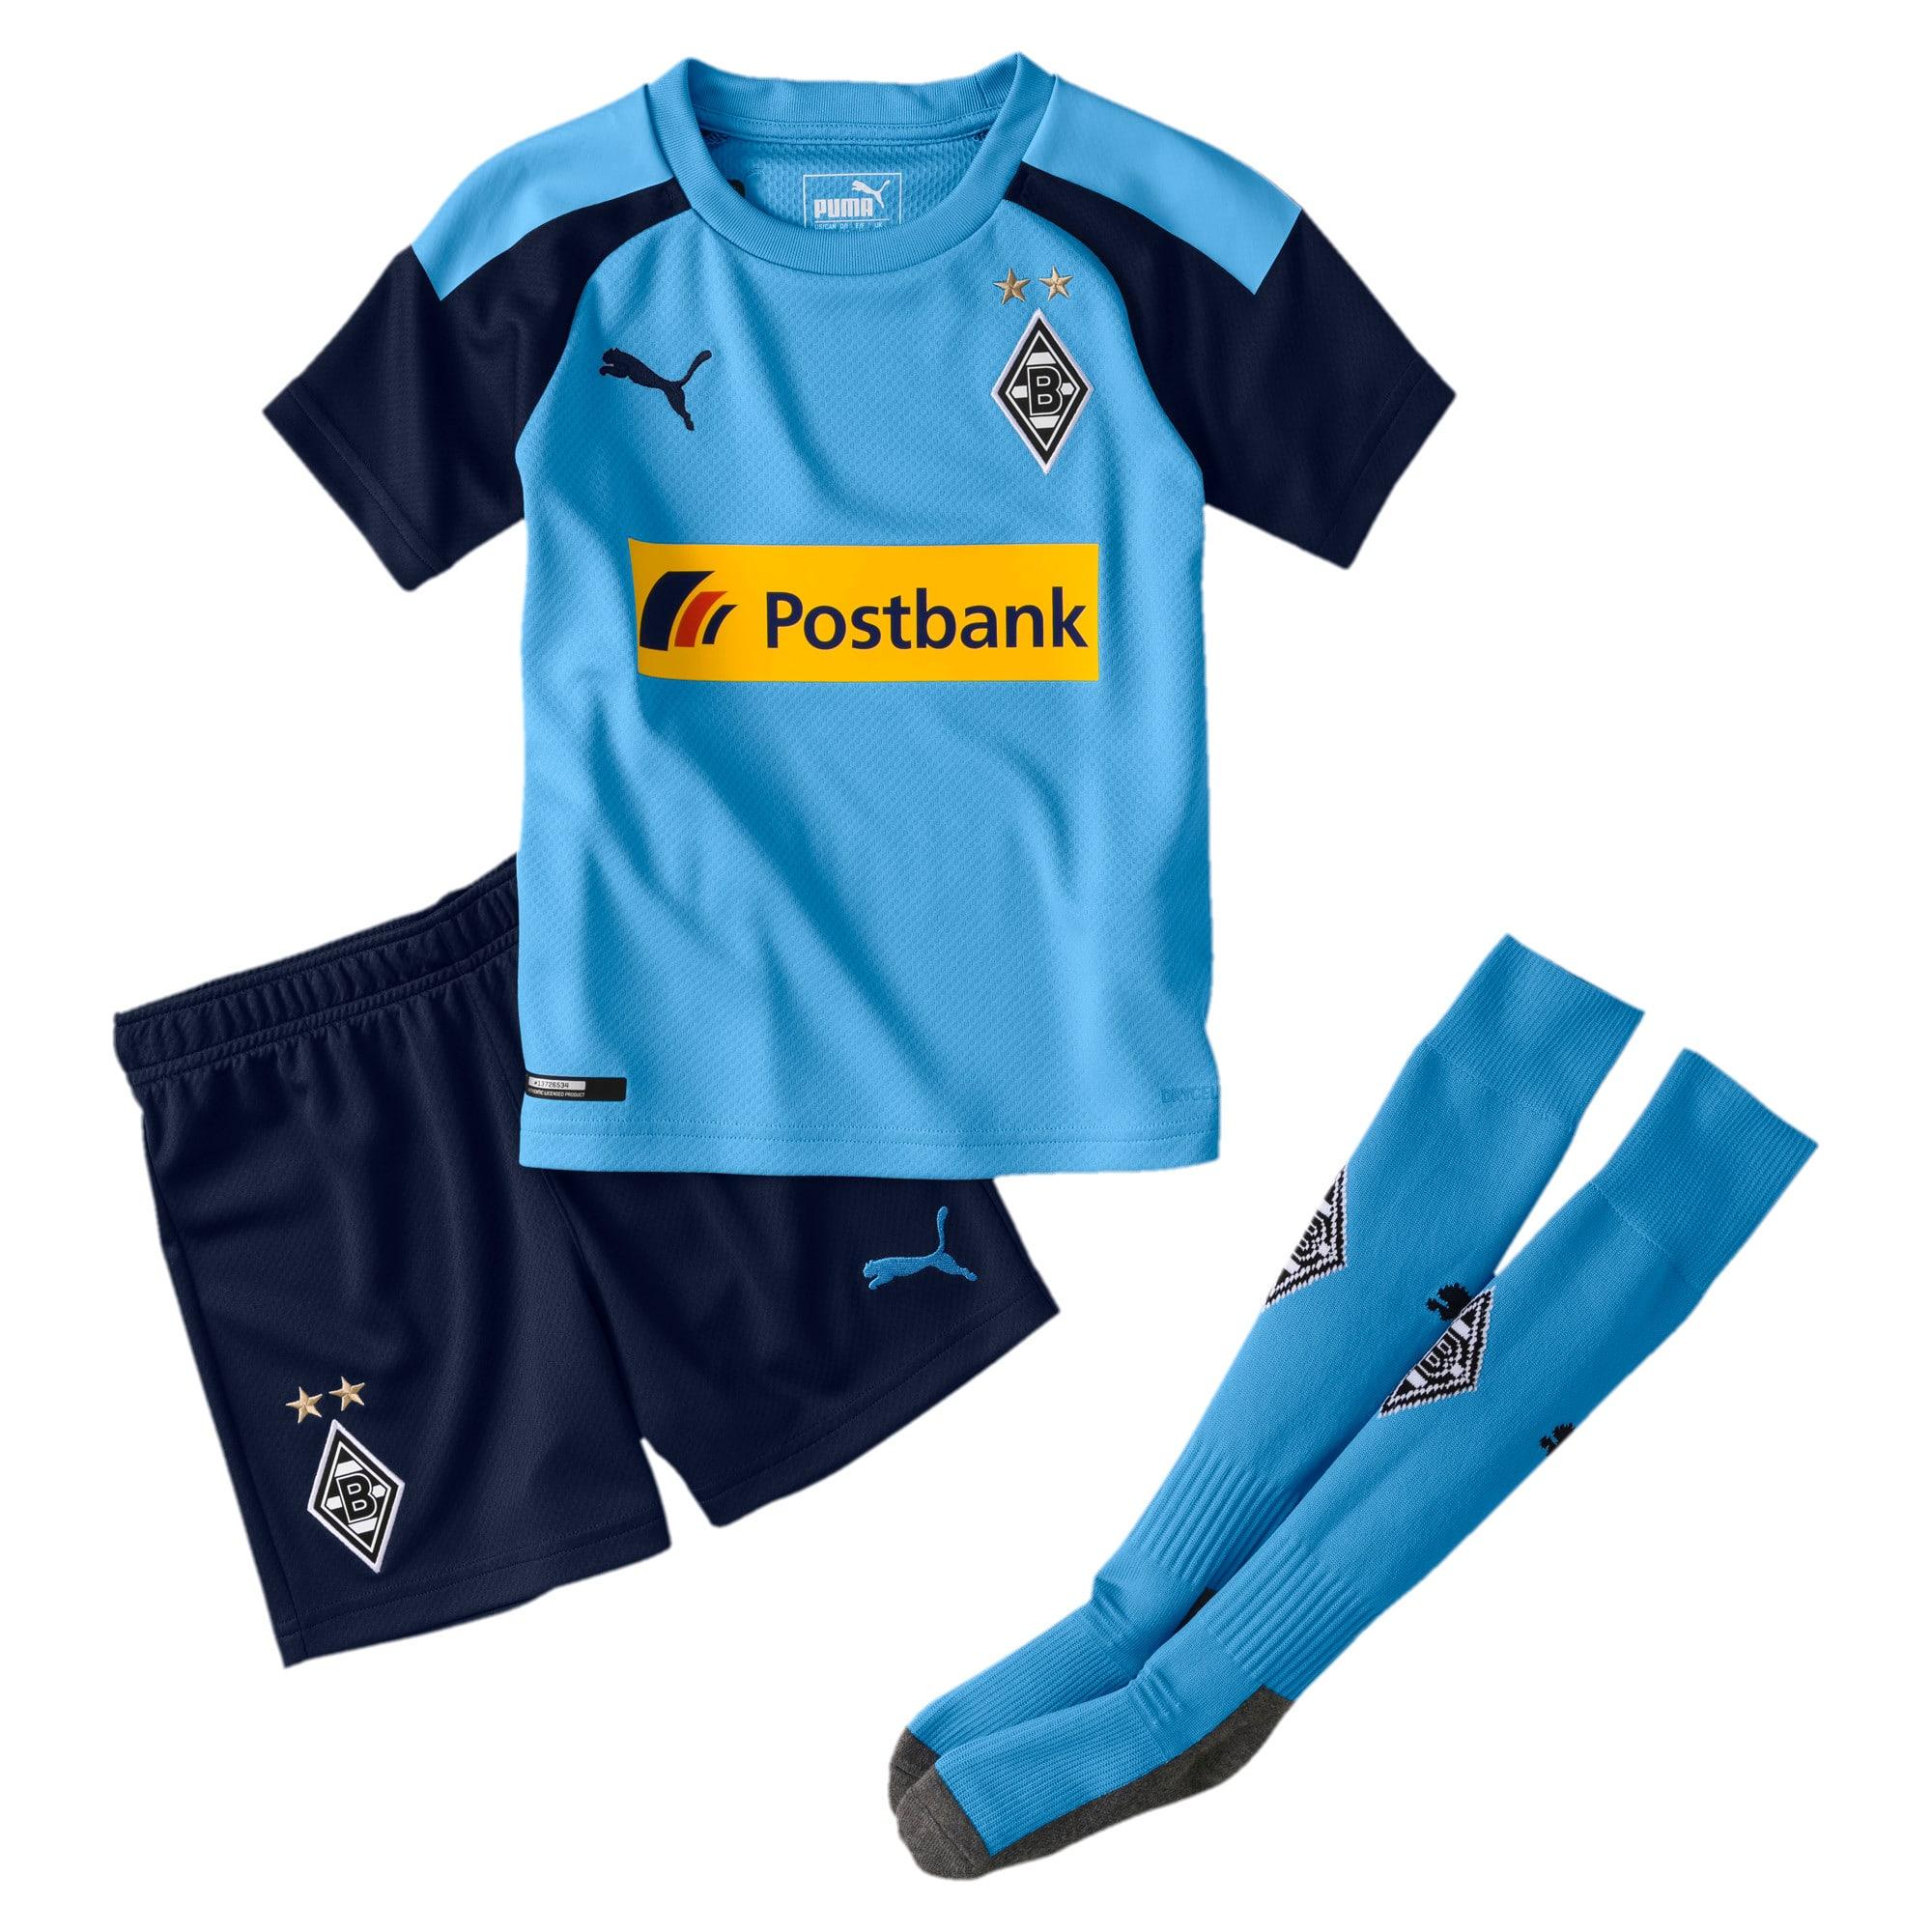 Thumbnail 1 of Borussia Mönchengladbach Away Kids' Mini Kit, Team Light Blue-Peacoat, medium